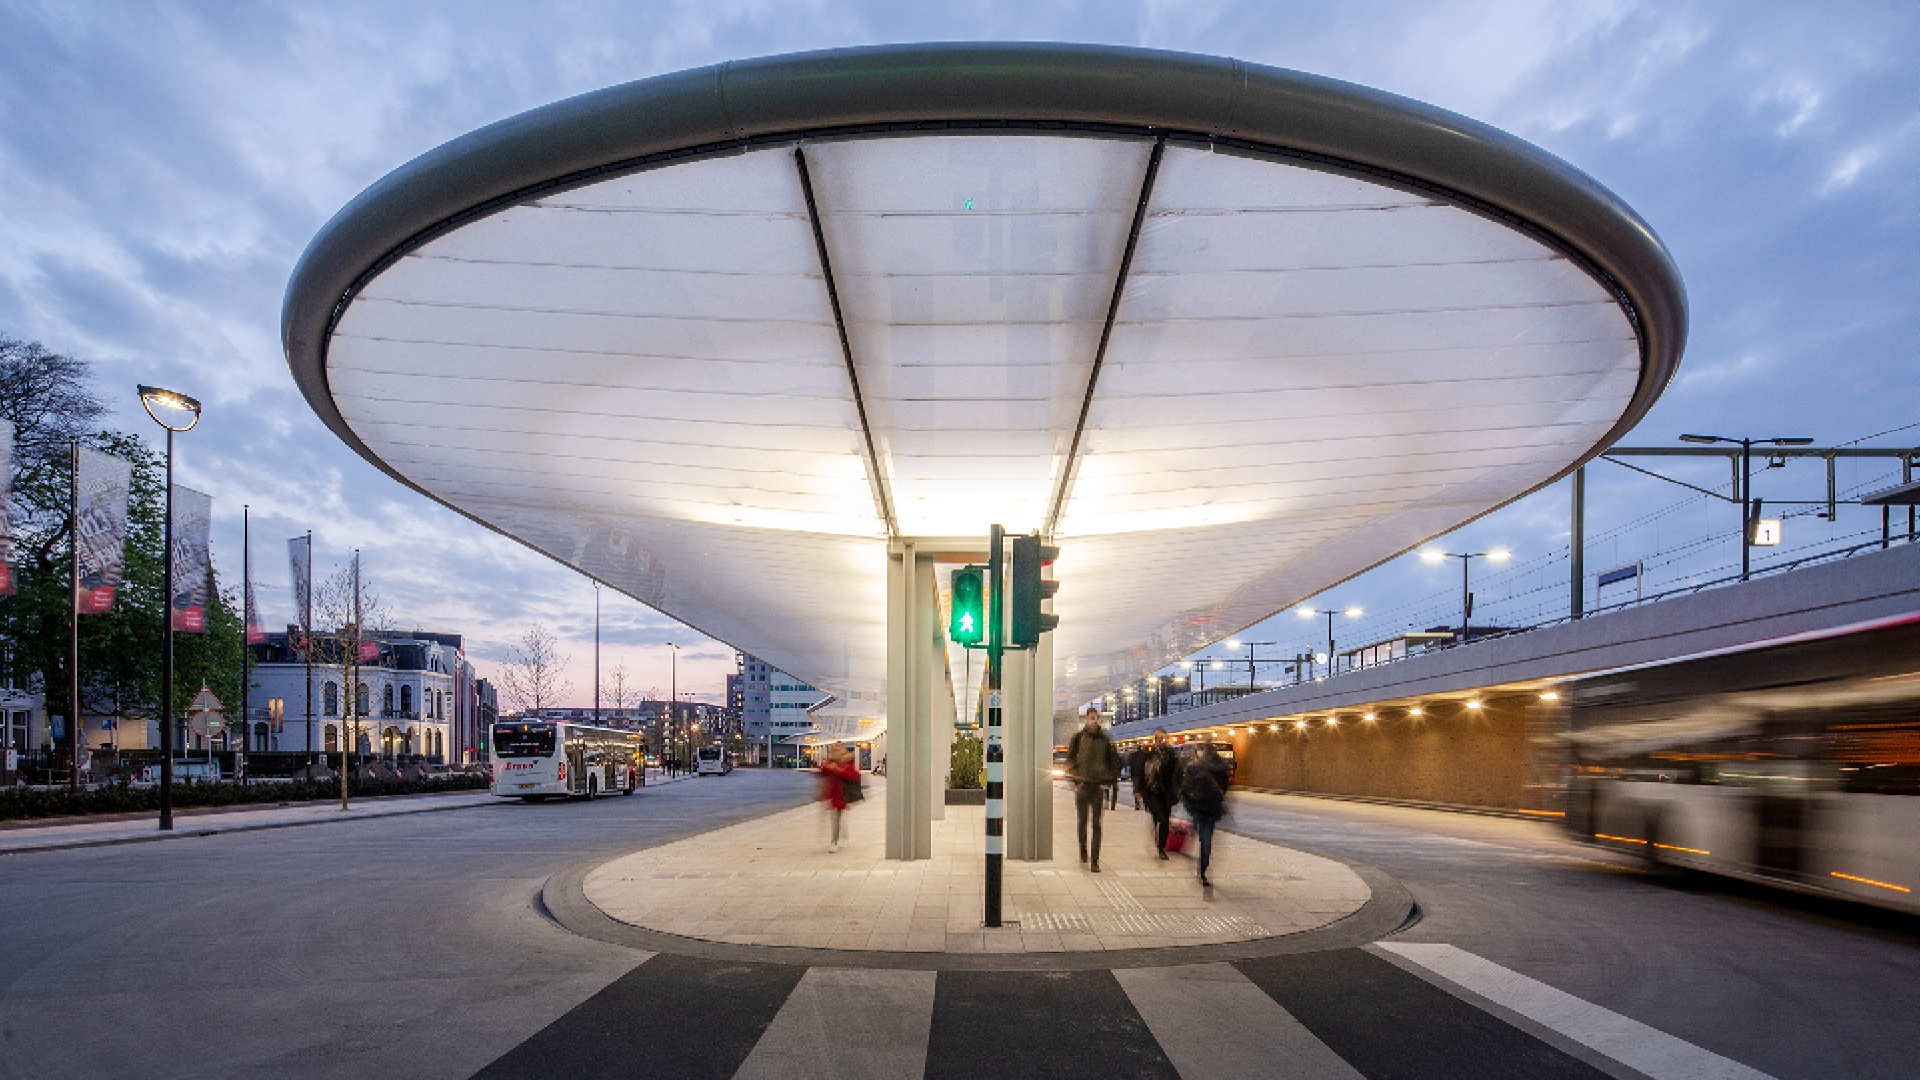 Tilburg's solar-powered bus station shows the way forward for transportation design